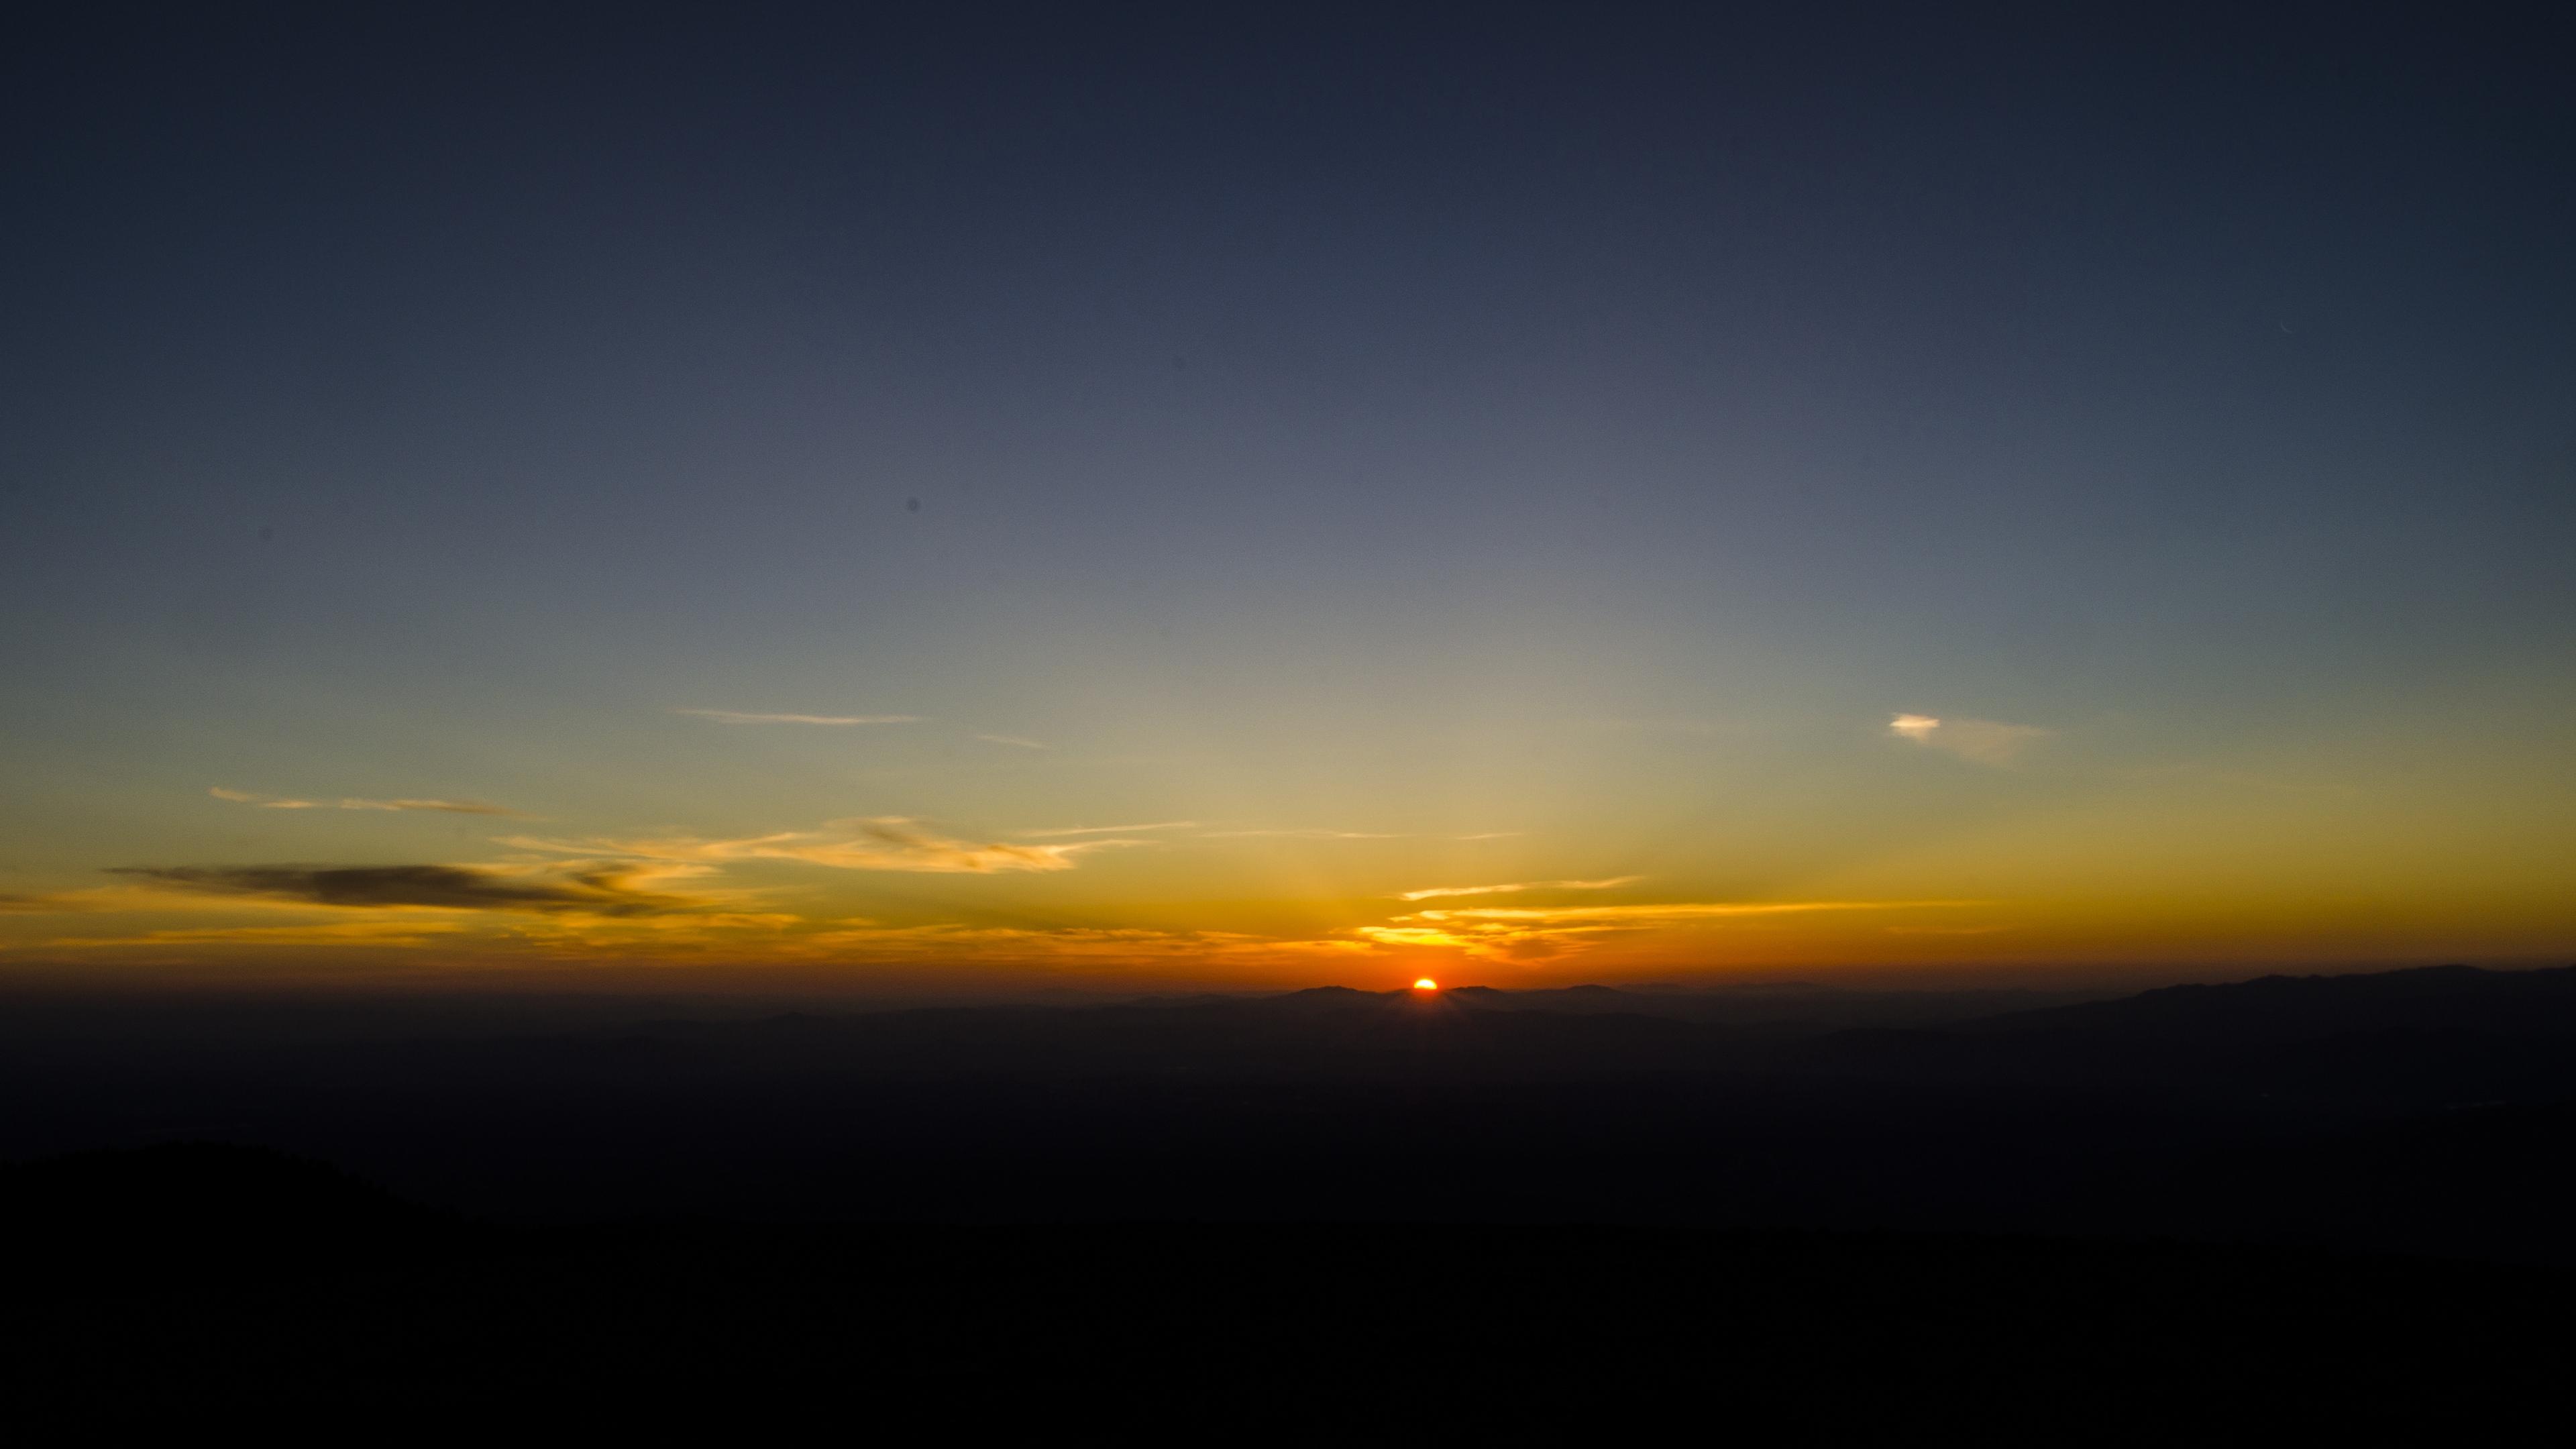 dawn horizon mountains sun sky dark sunrise 4k 1541113667 - dawn, horizon, mountains, sun, sky, dark, sunrise 4k - Mountains, Horizon, Dawn